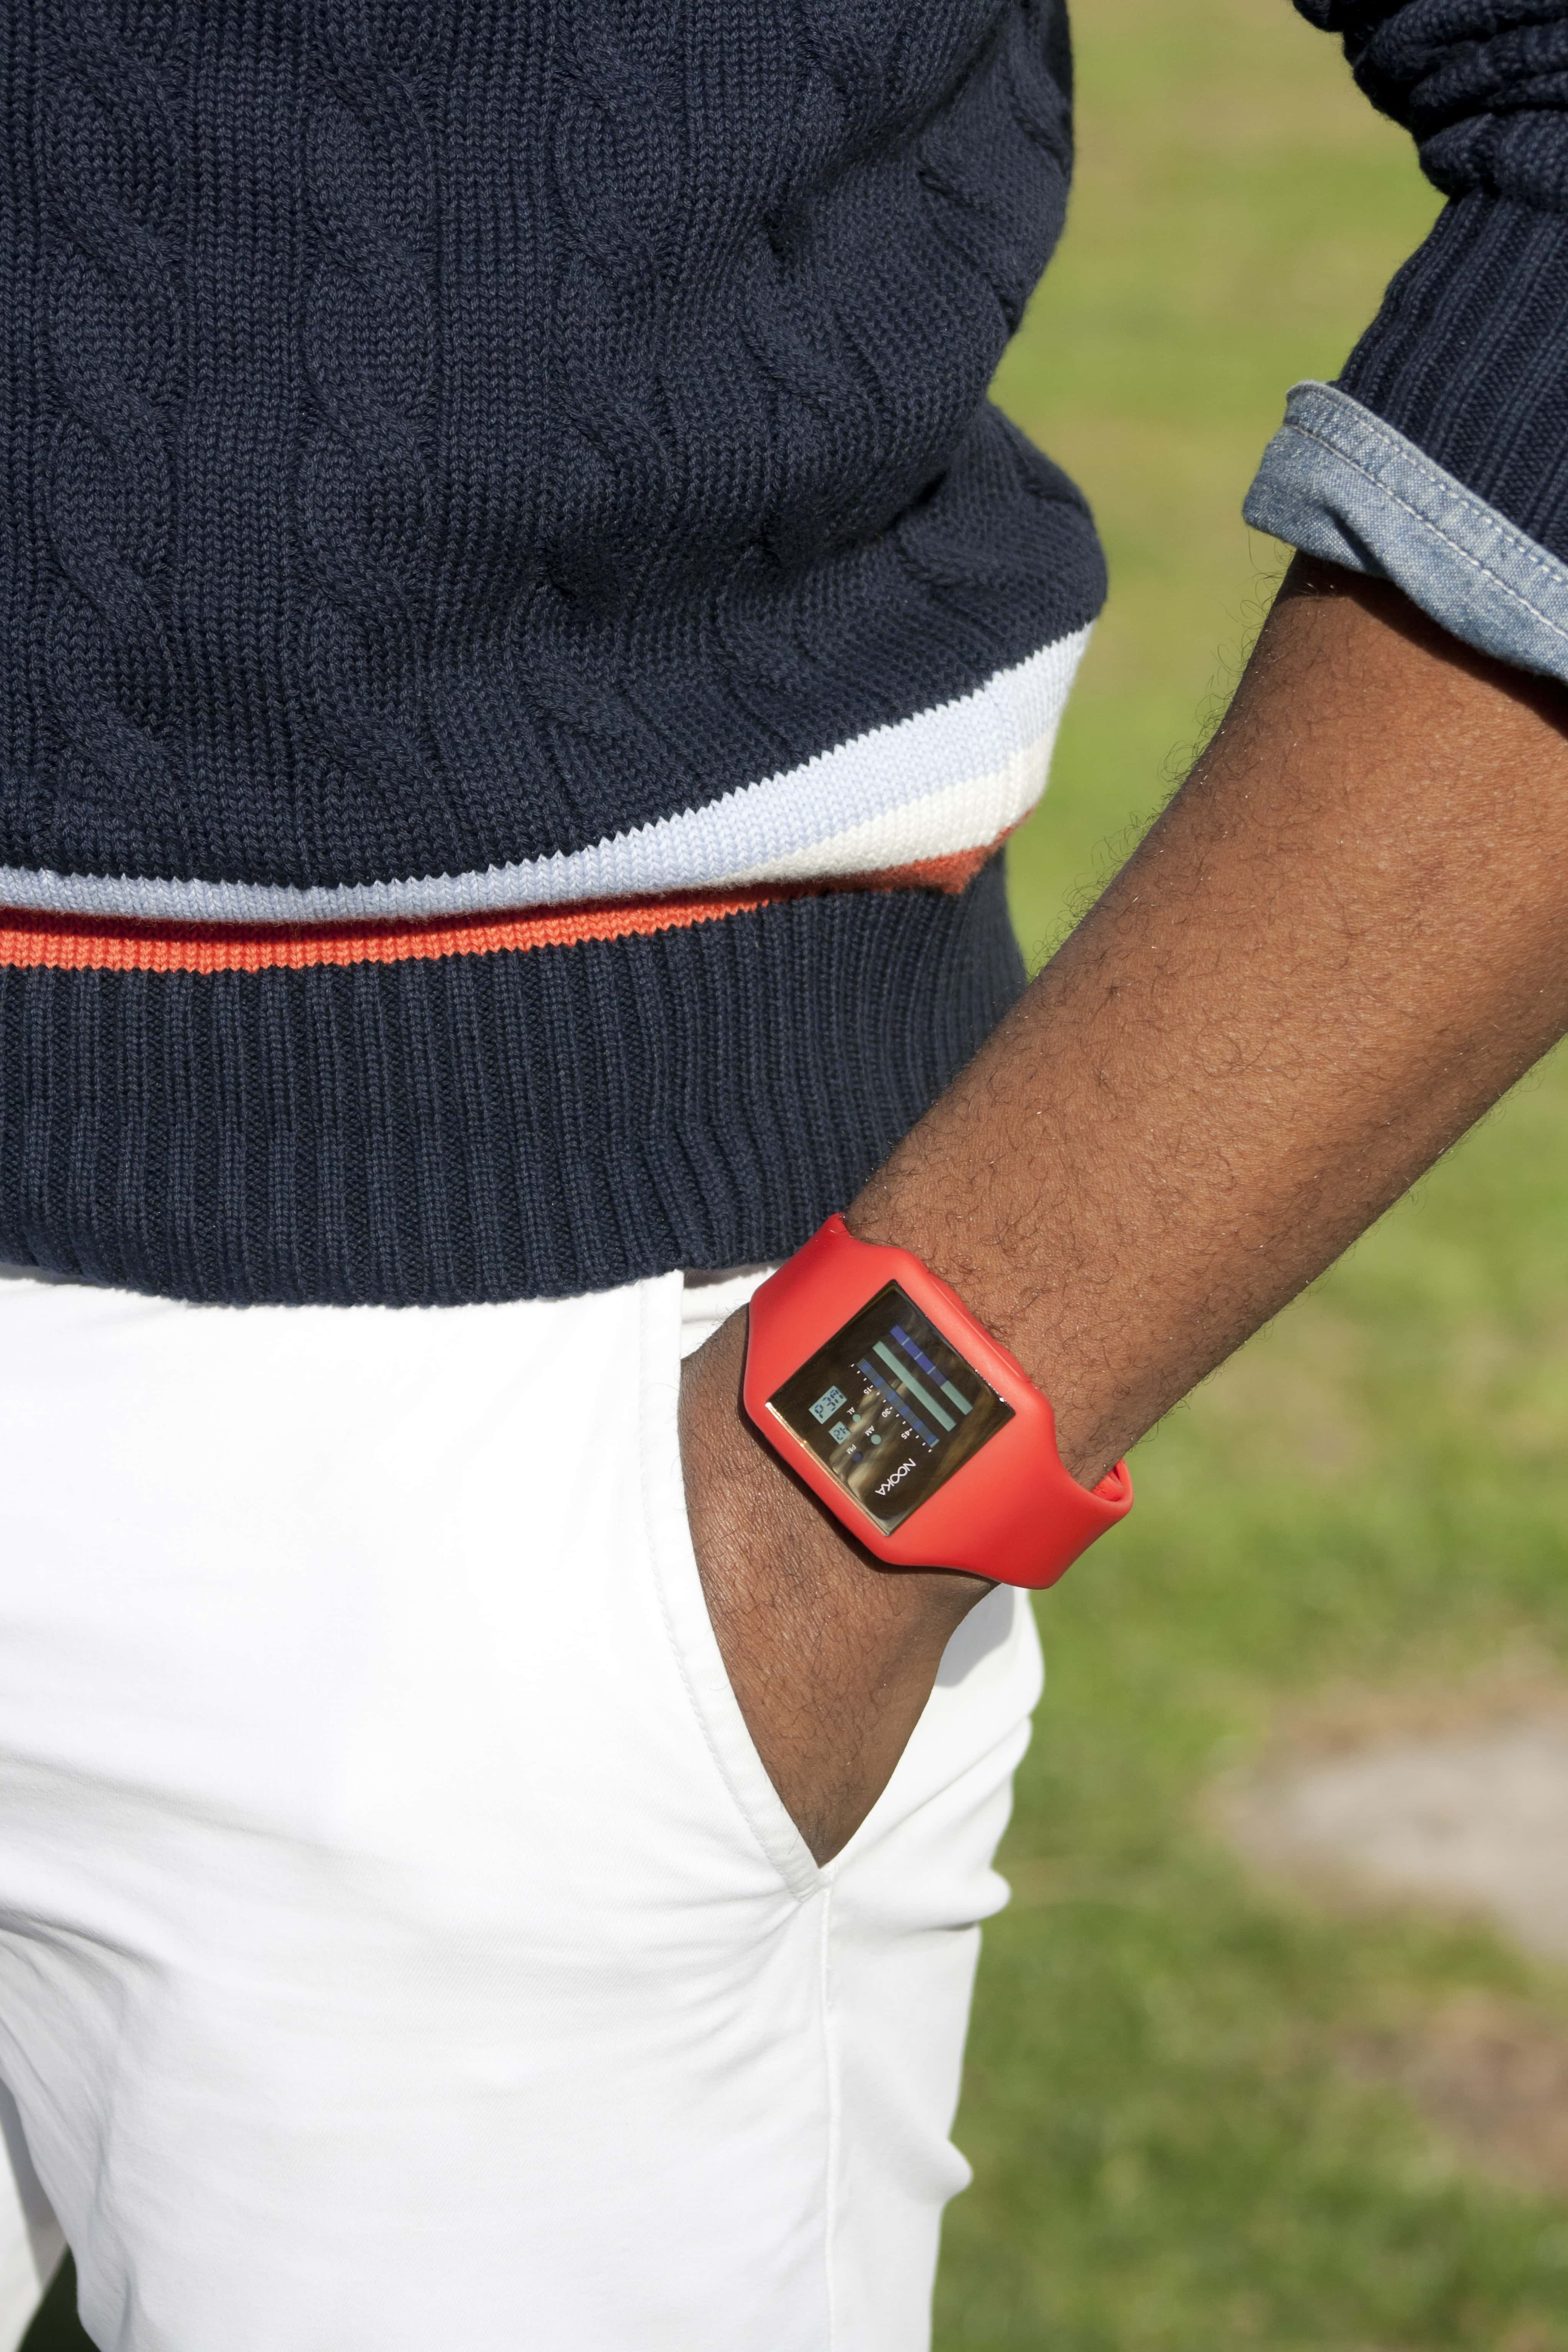 Sabir in Uniqlo Cricket Sweater with Nooka Watch